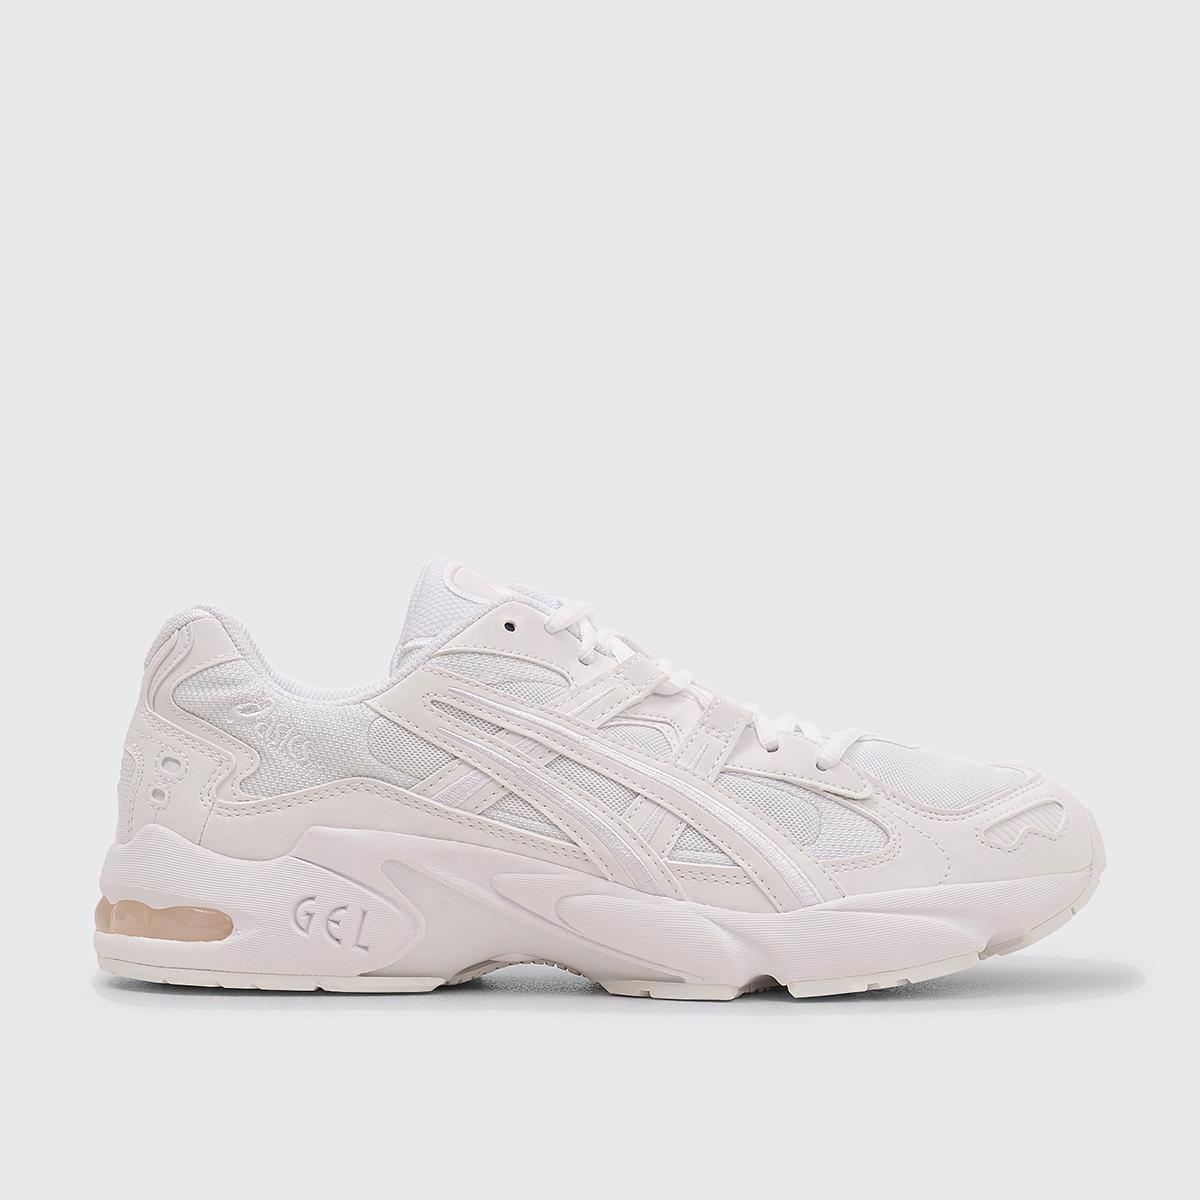 Latest Asics Sneakers Well Sale Mens Asics Gel Kayano 23